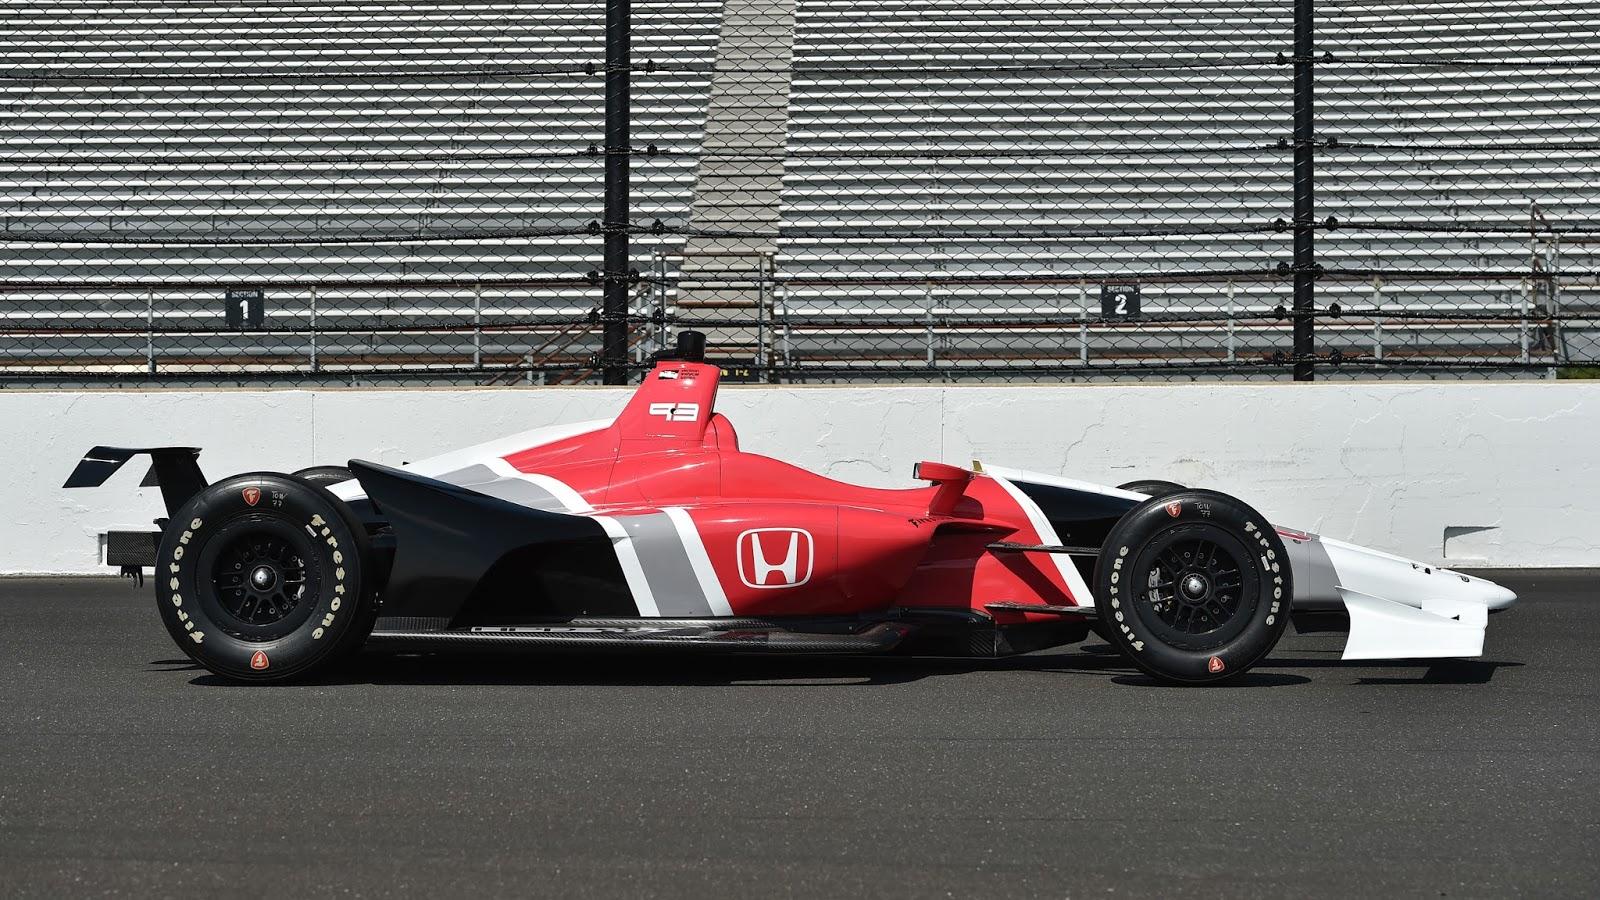 Indy Honda Used Cars